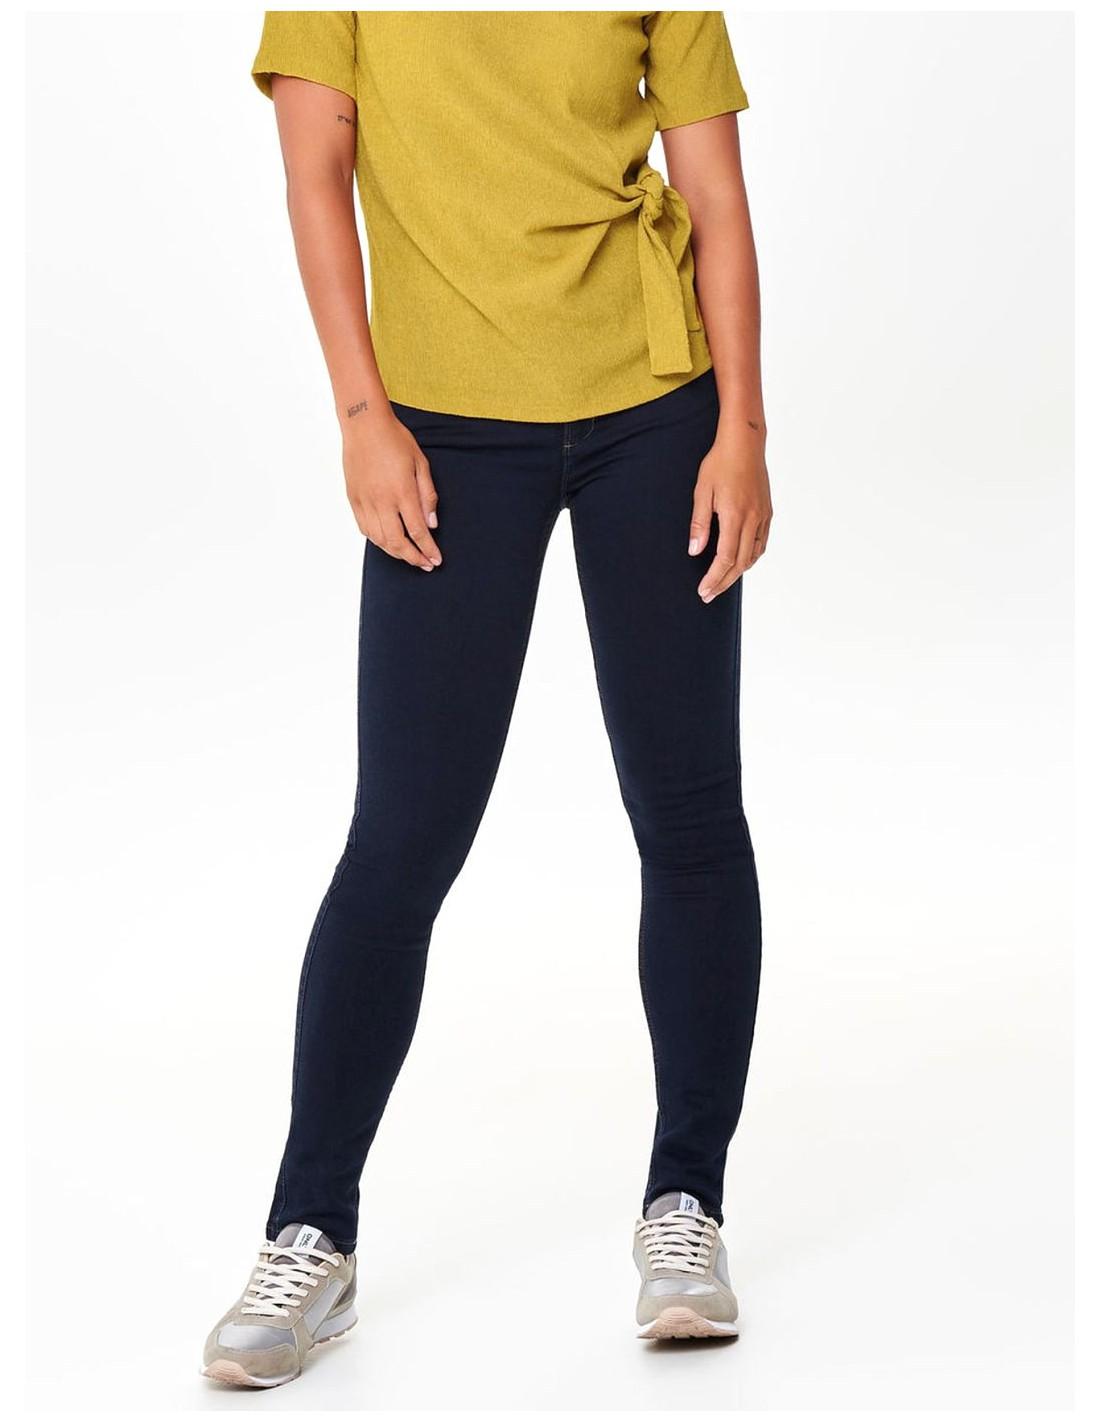 Vaqueros Slim Mujer Only Onlultimate King Reg Jeans Crya012 Noos